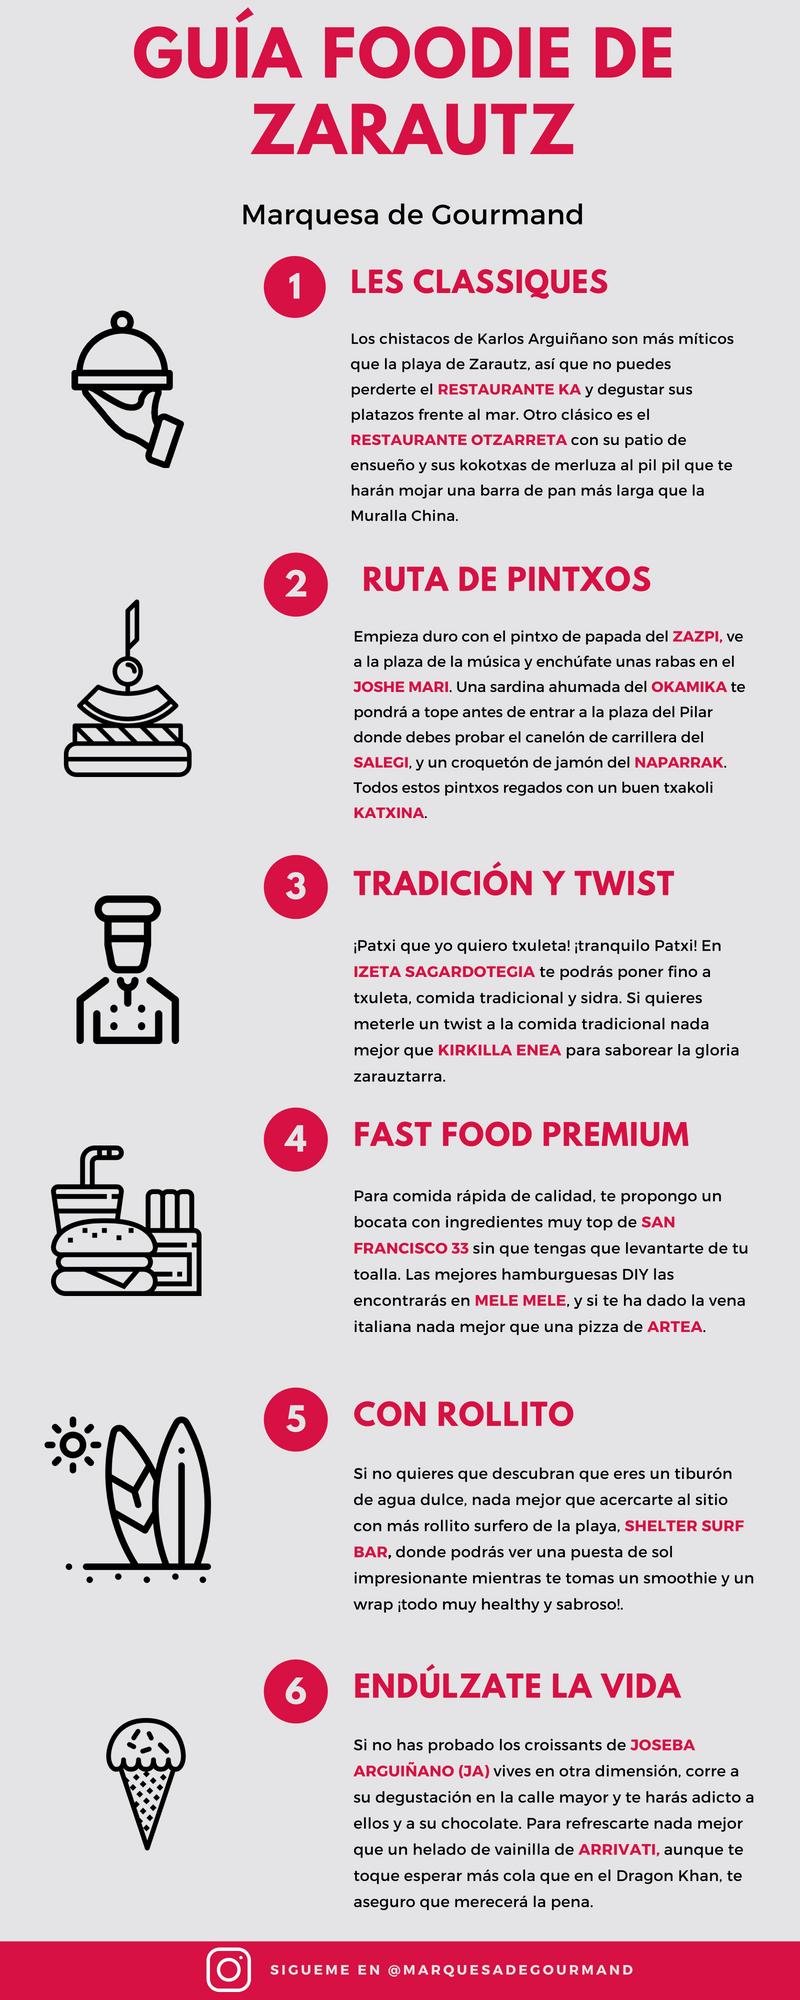 Guía foodie Zarautz by Marquesa de Gourmand